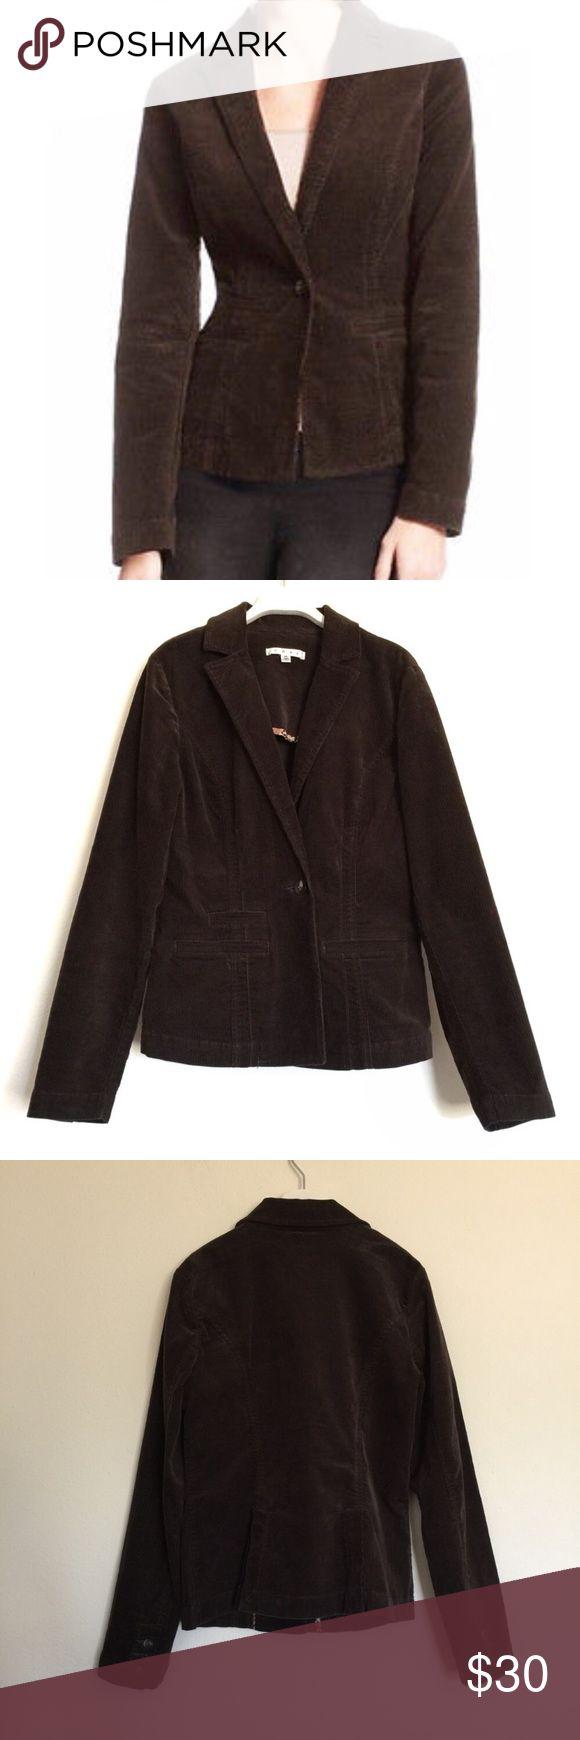 Cabi Medium CAbi Jackets & Coats Blazers